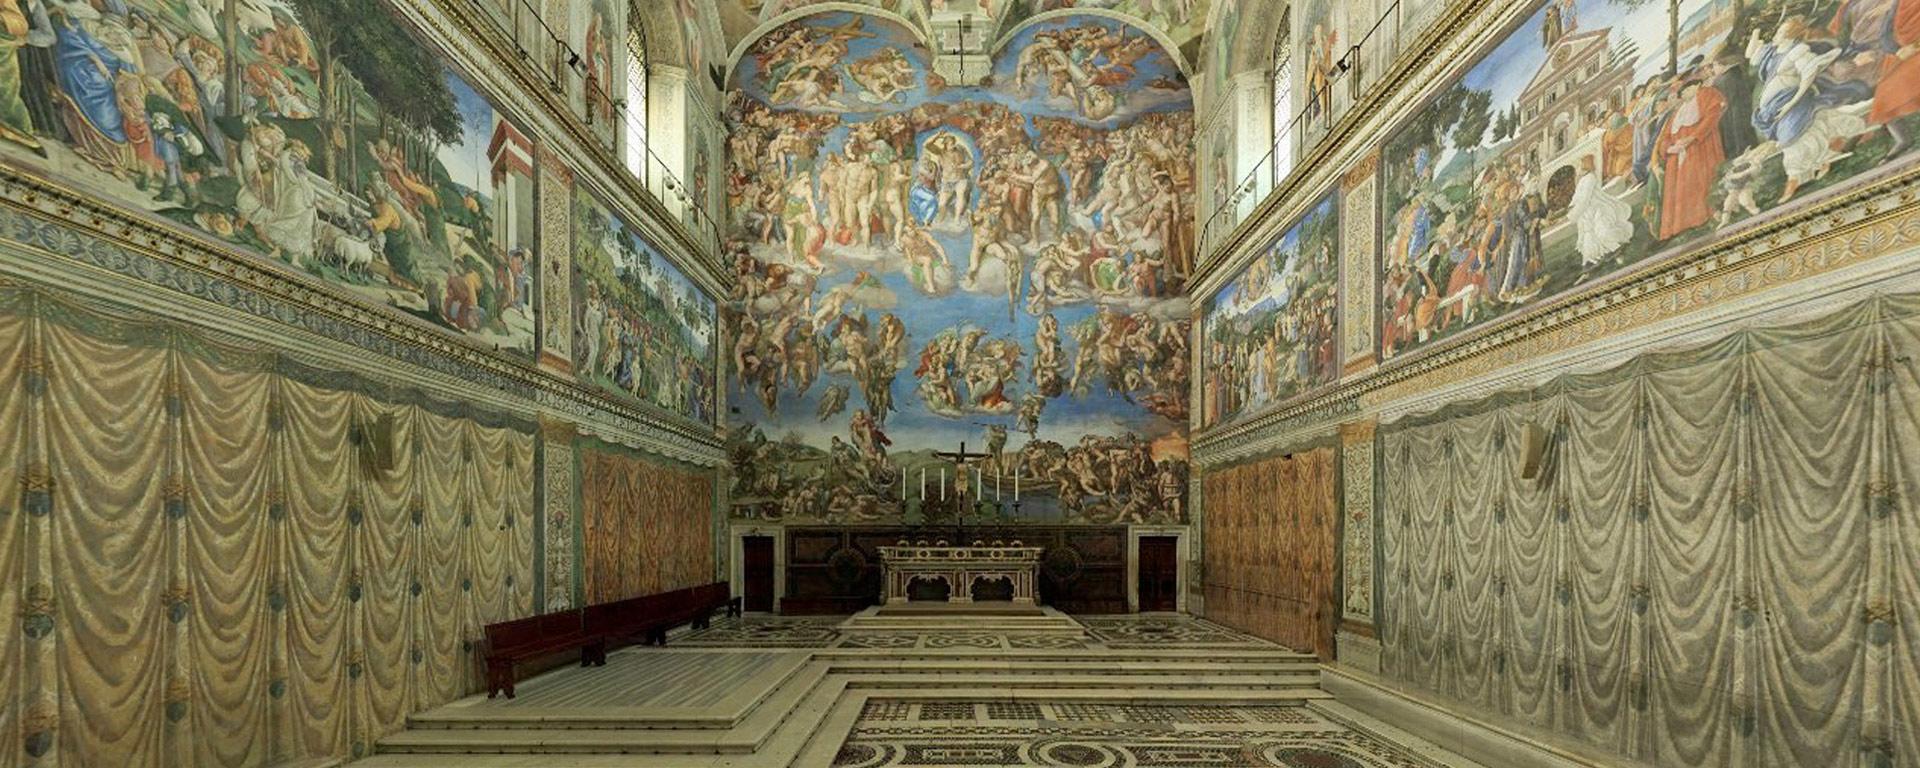 sistine-chapel-large